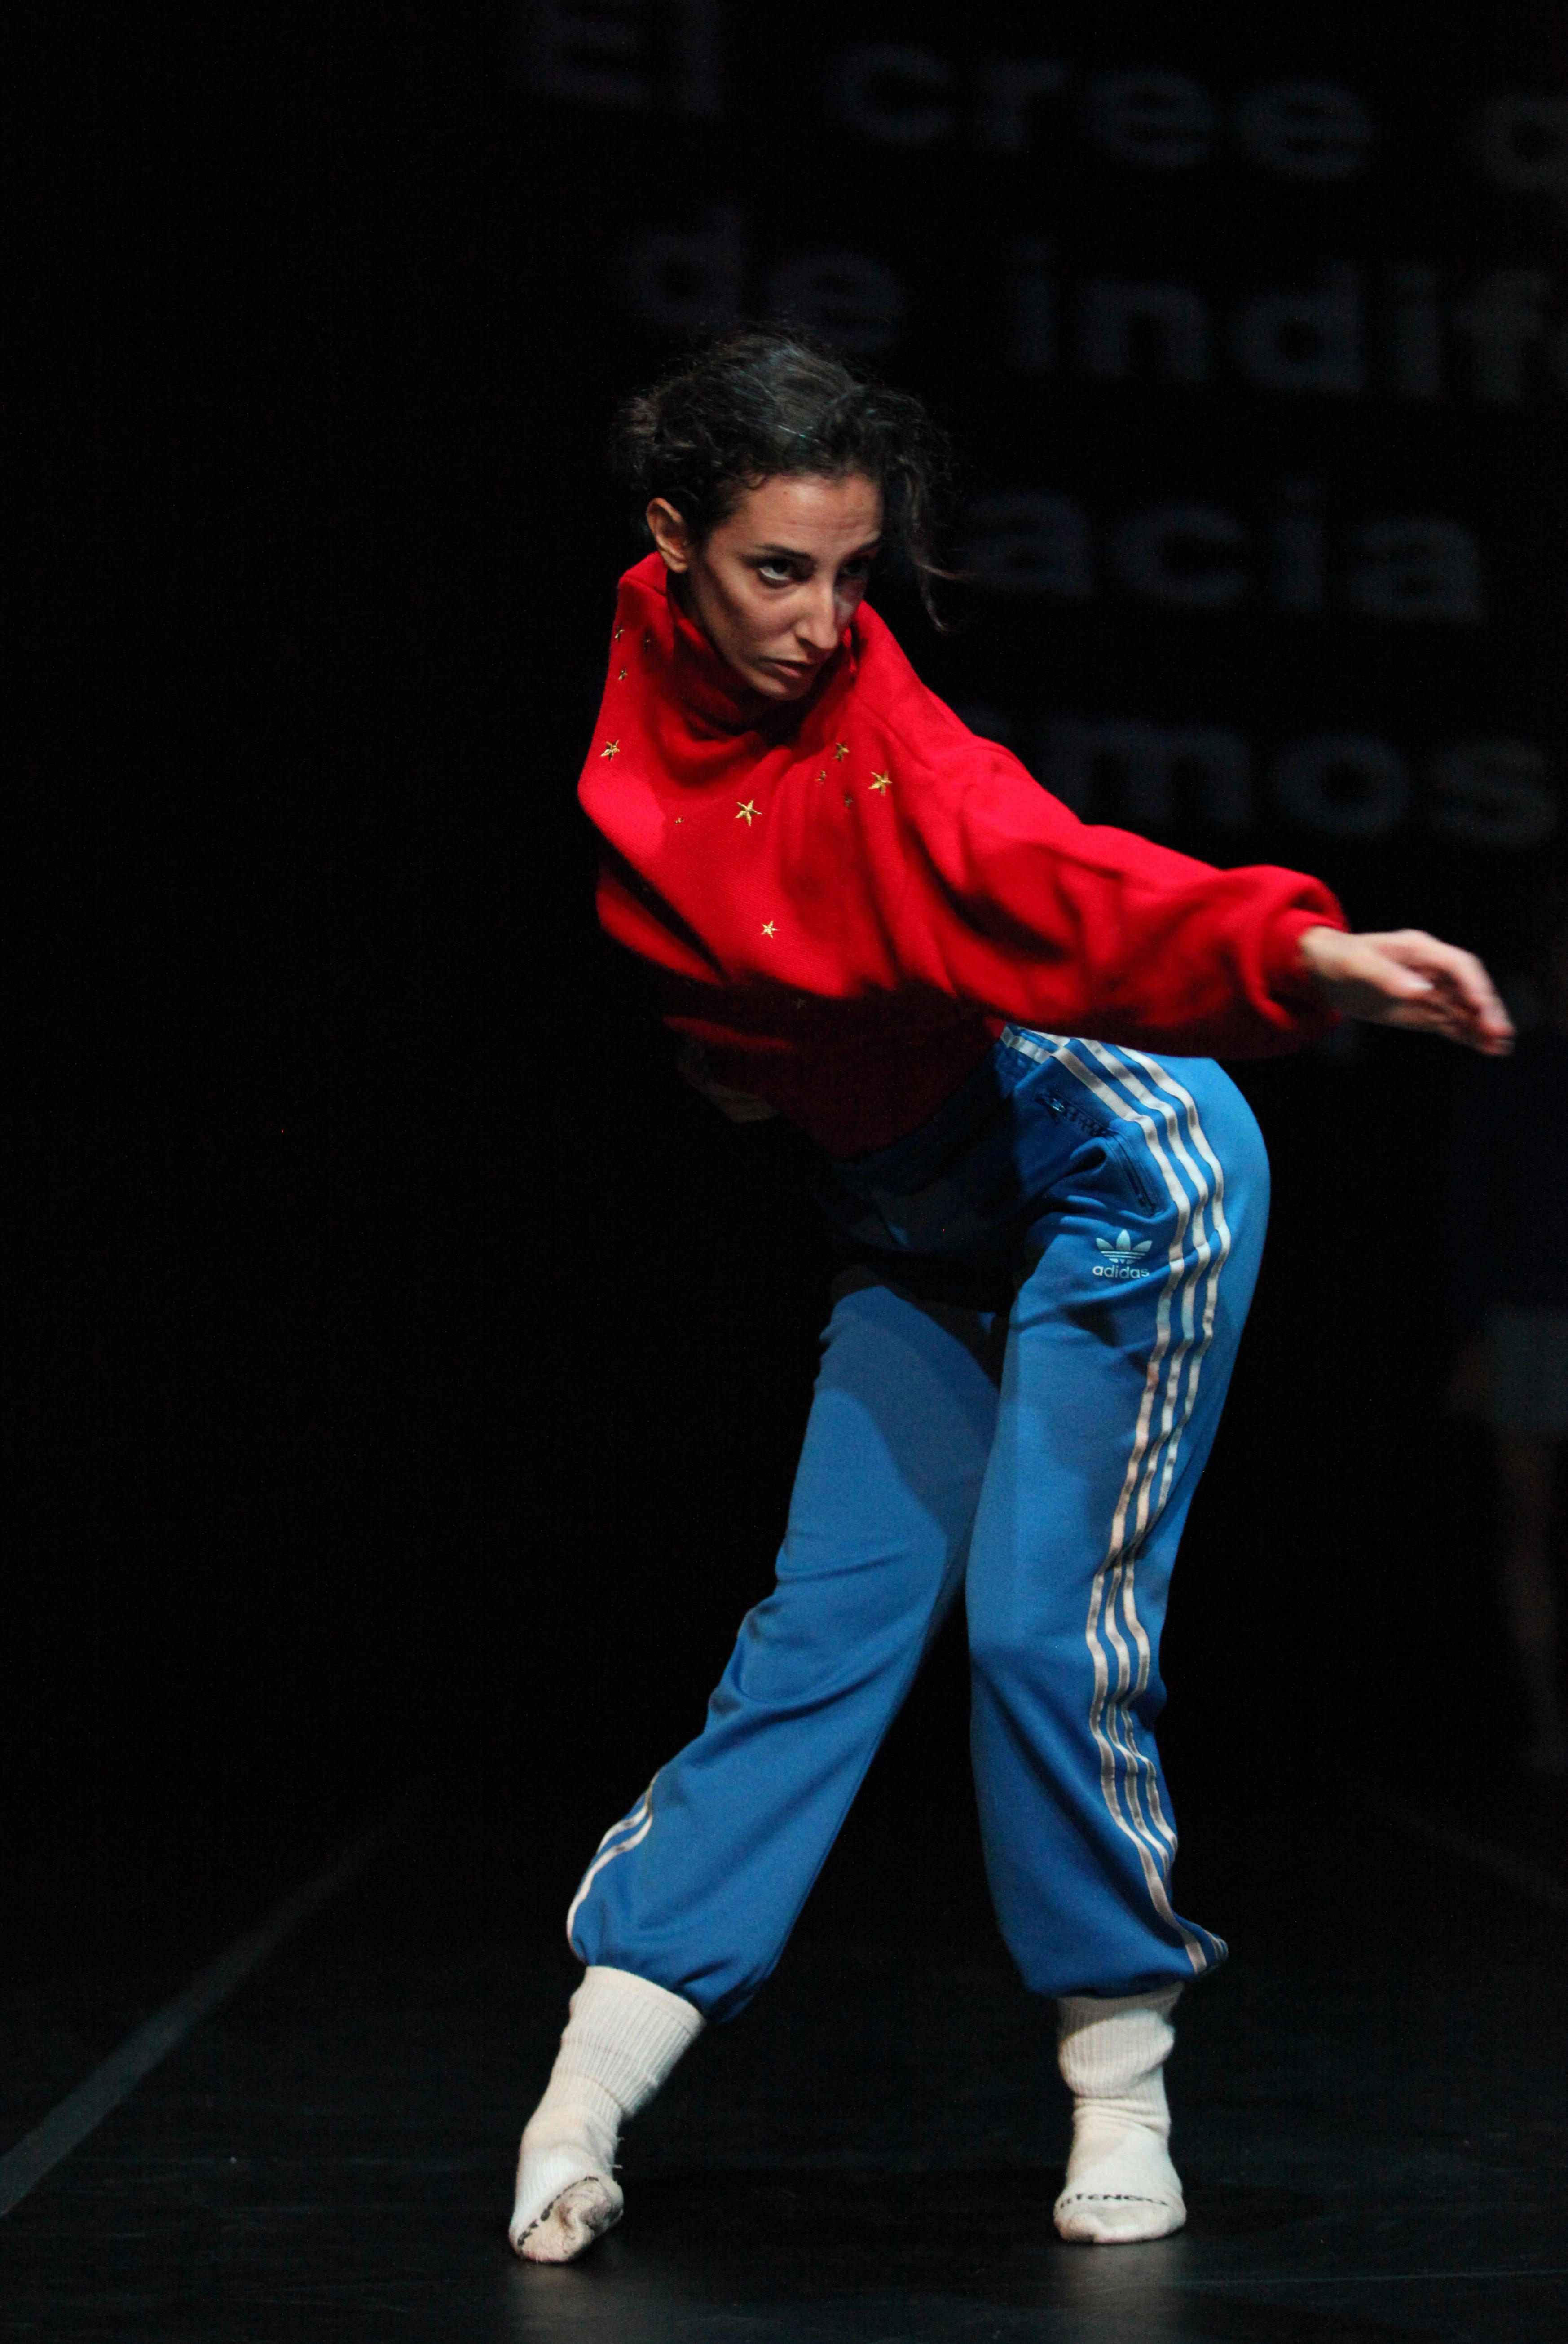 https://www.danzaurbana.eu/associazione/wp-content/uploads/2018/05/Masdanza_Veronal_2_2015.jpg